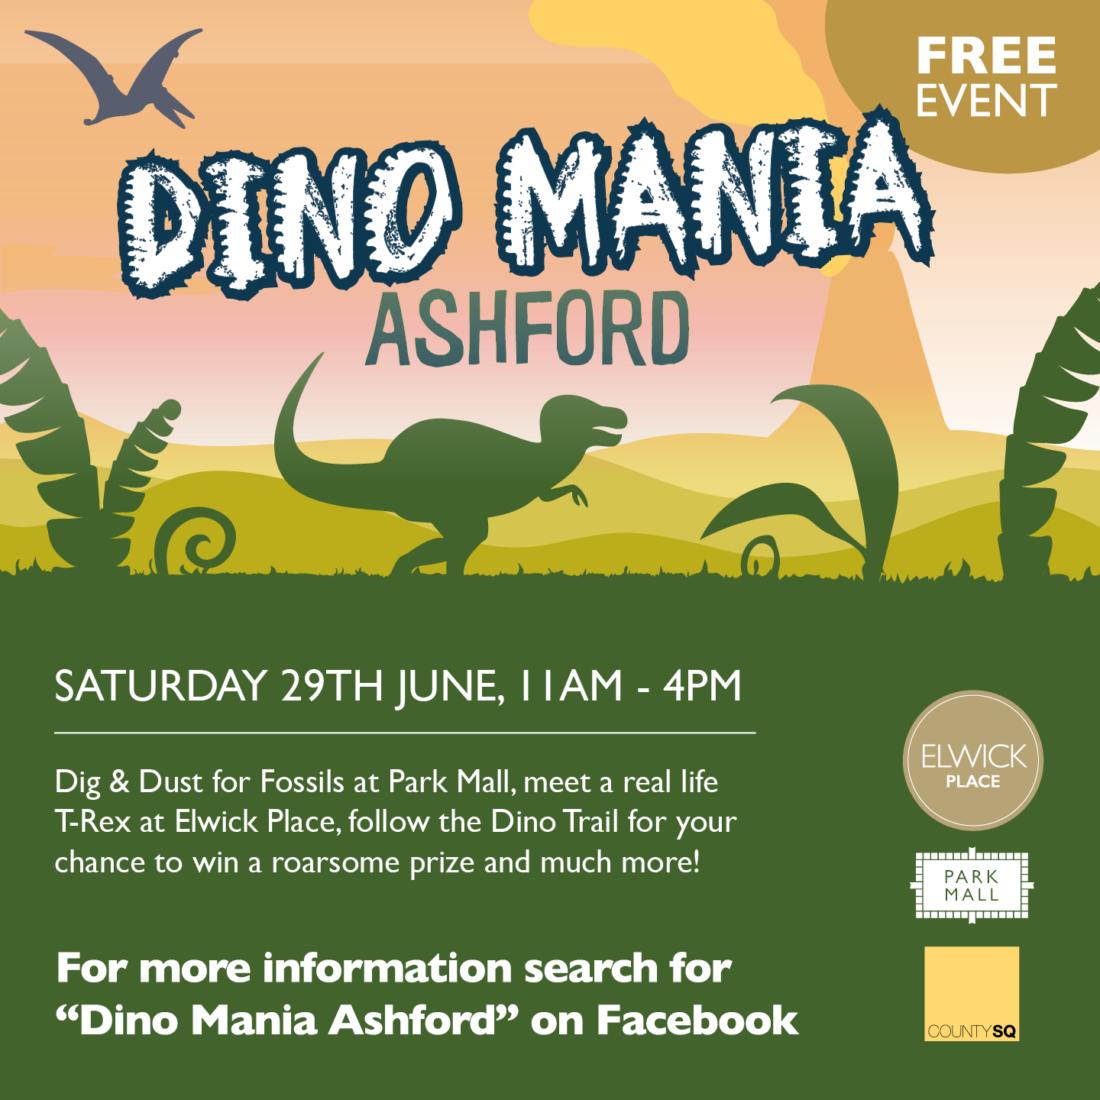 Dino Mania event image